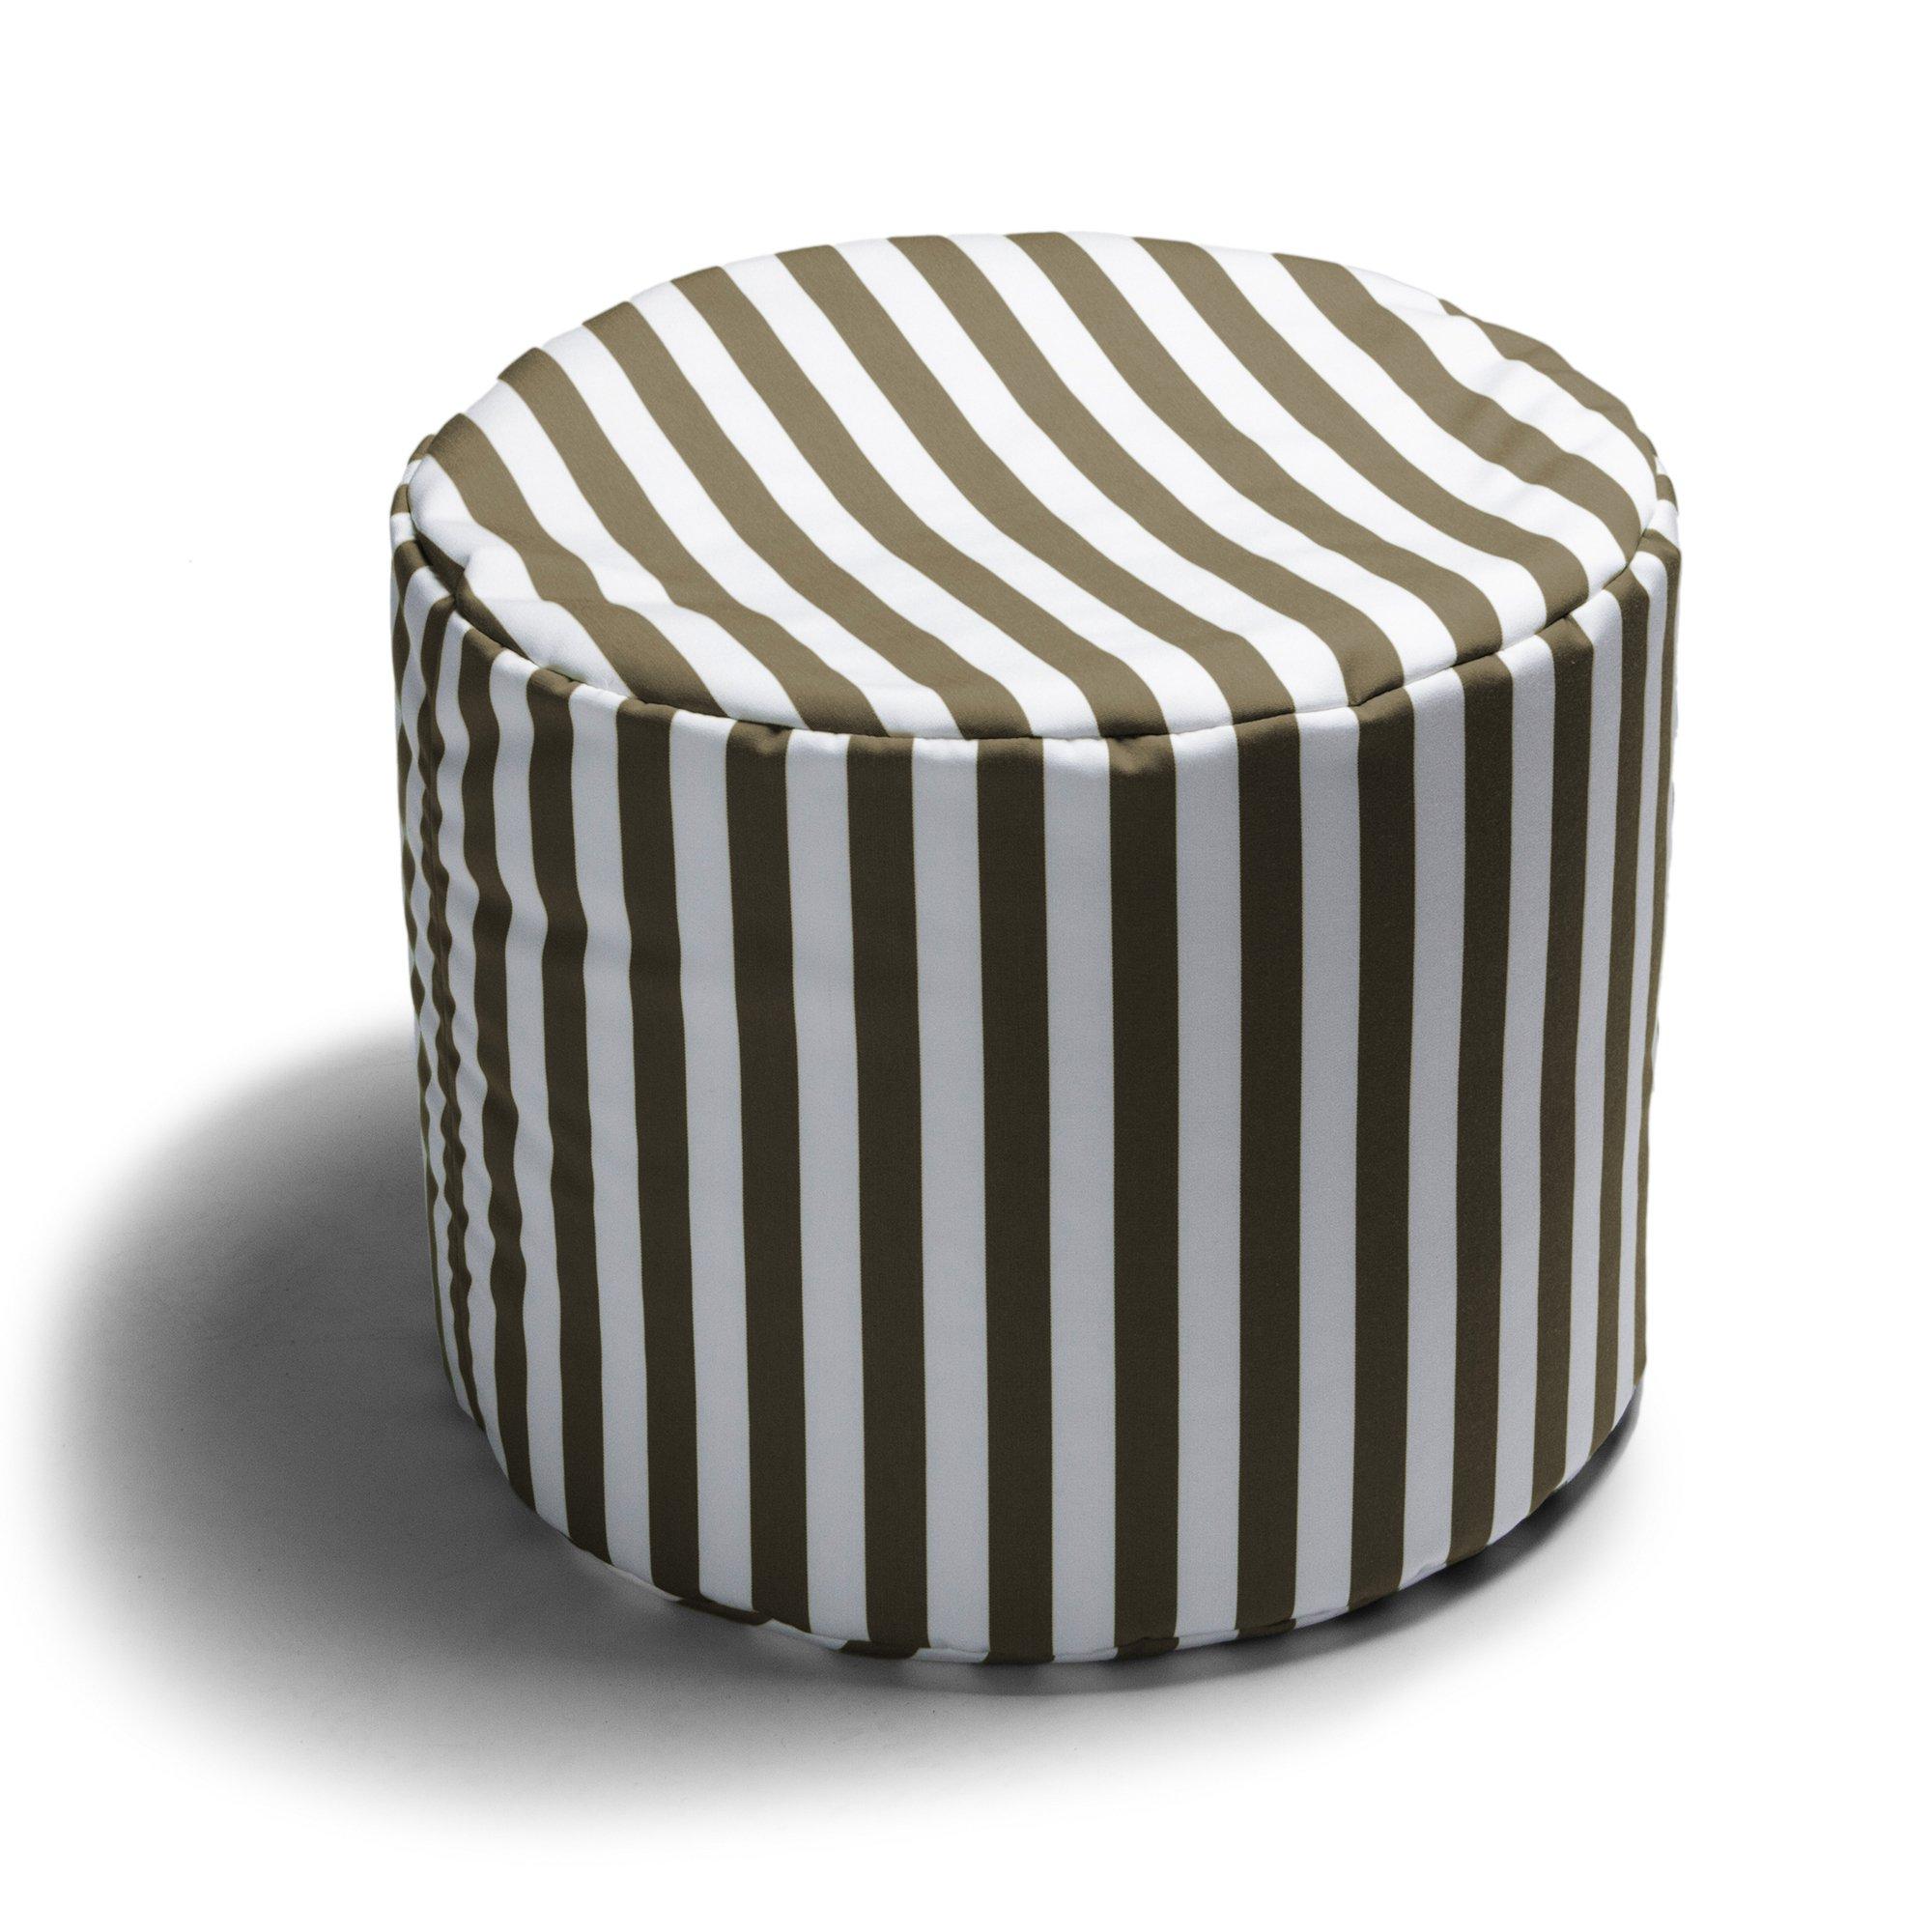 Jaxx Spring Indoor/Outdoor Bean Bag Ottoman, Taupe Stripes